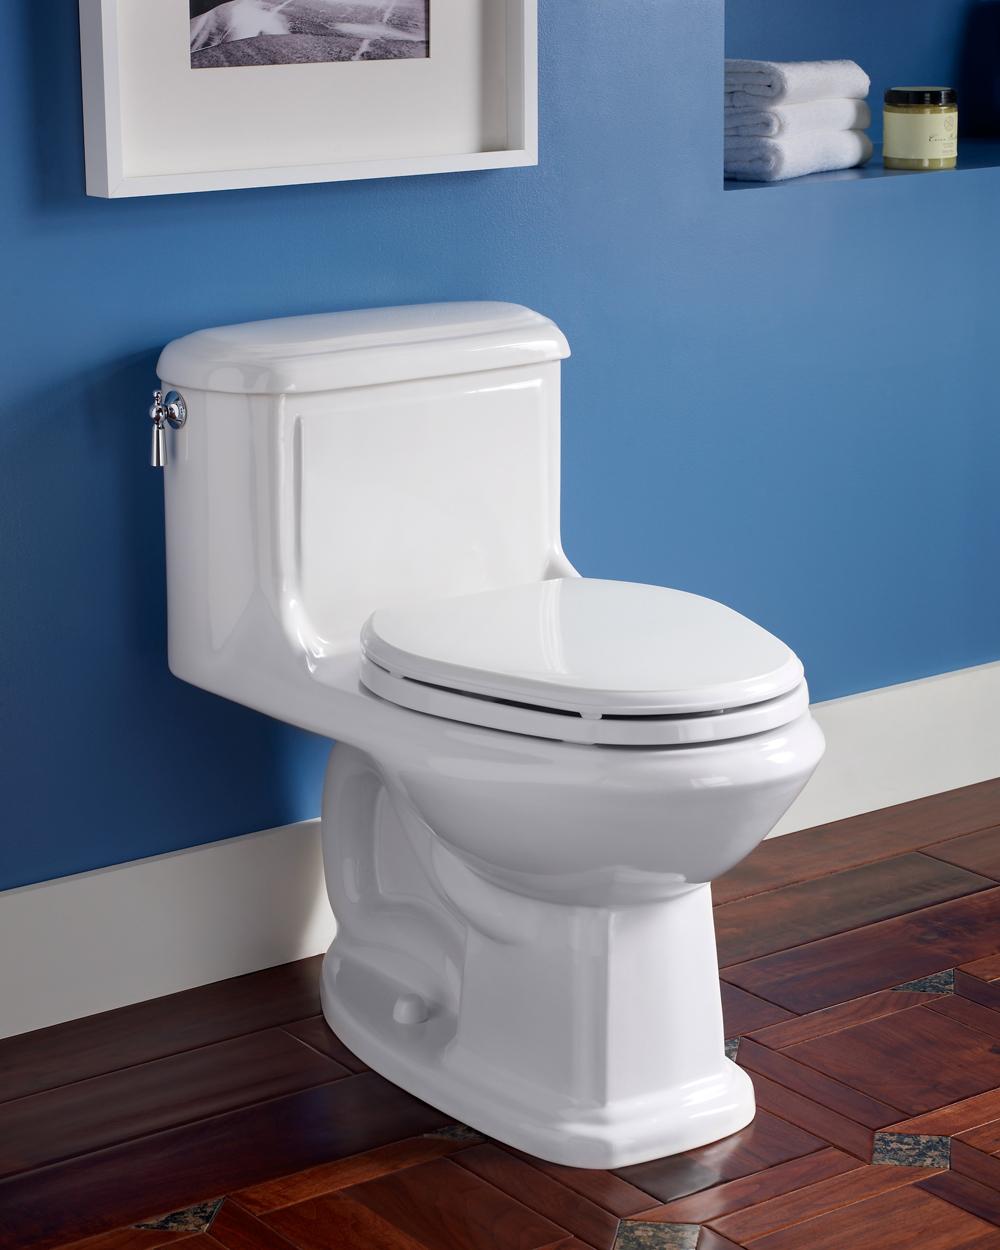 Bathroom Toilet : ... .222 Antiquity Cadet One-Piece Toilet with Seat, Linen - - Amazon.com